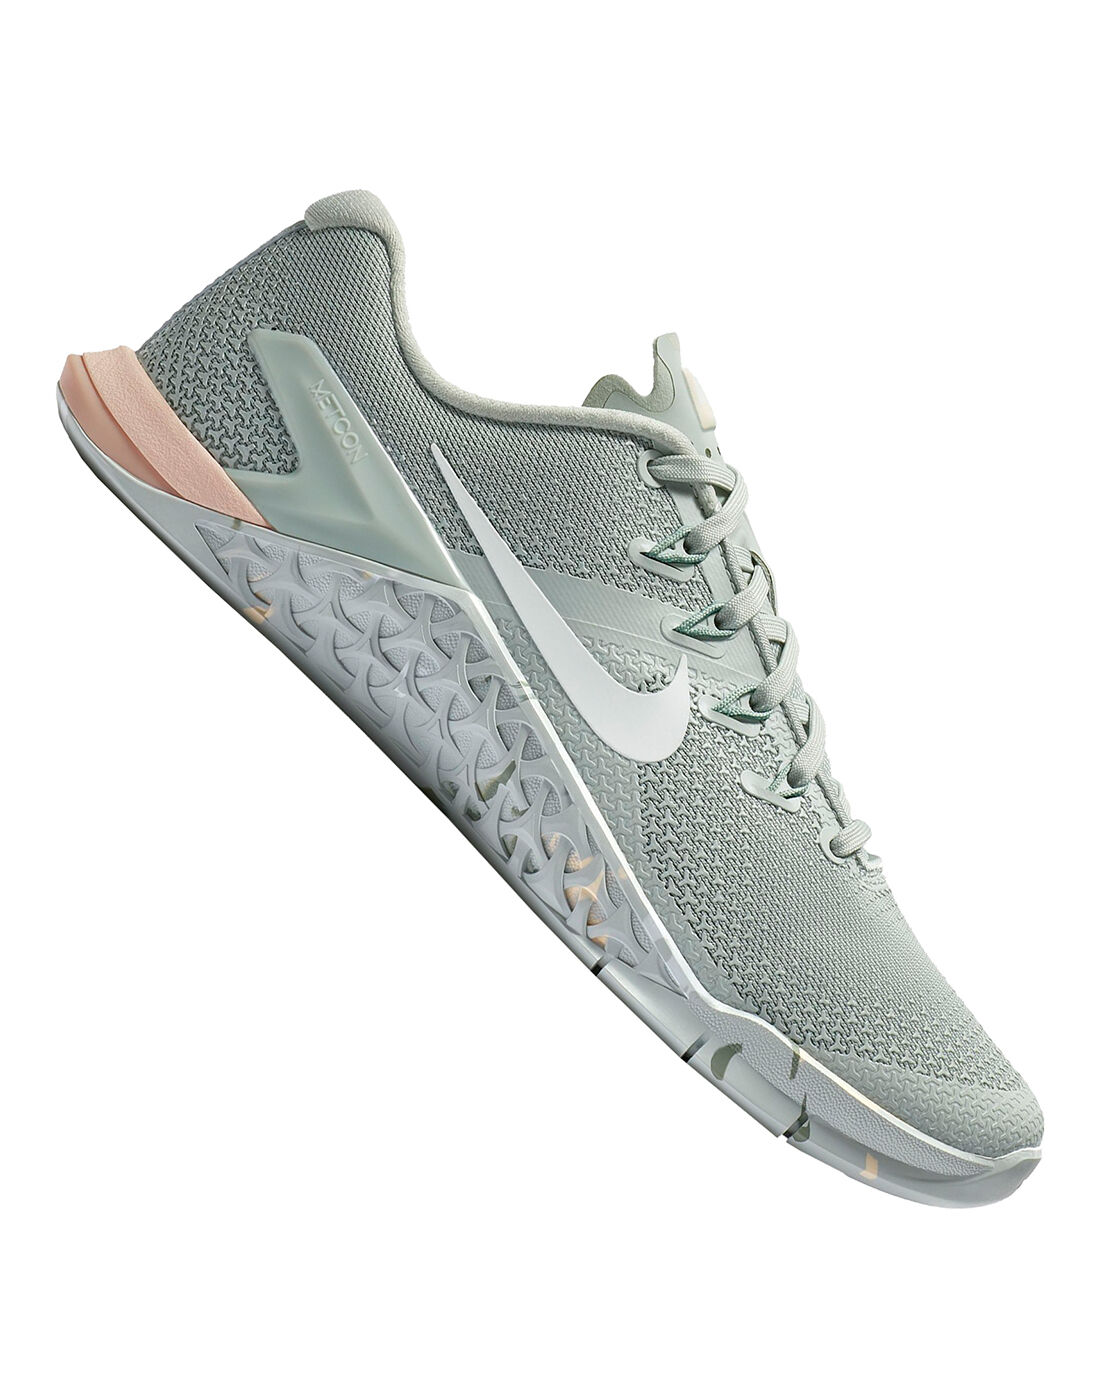 Women's Nike Metcon 4 | Grey | Life Style Sports